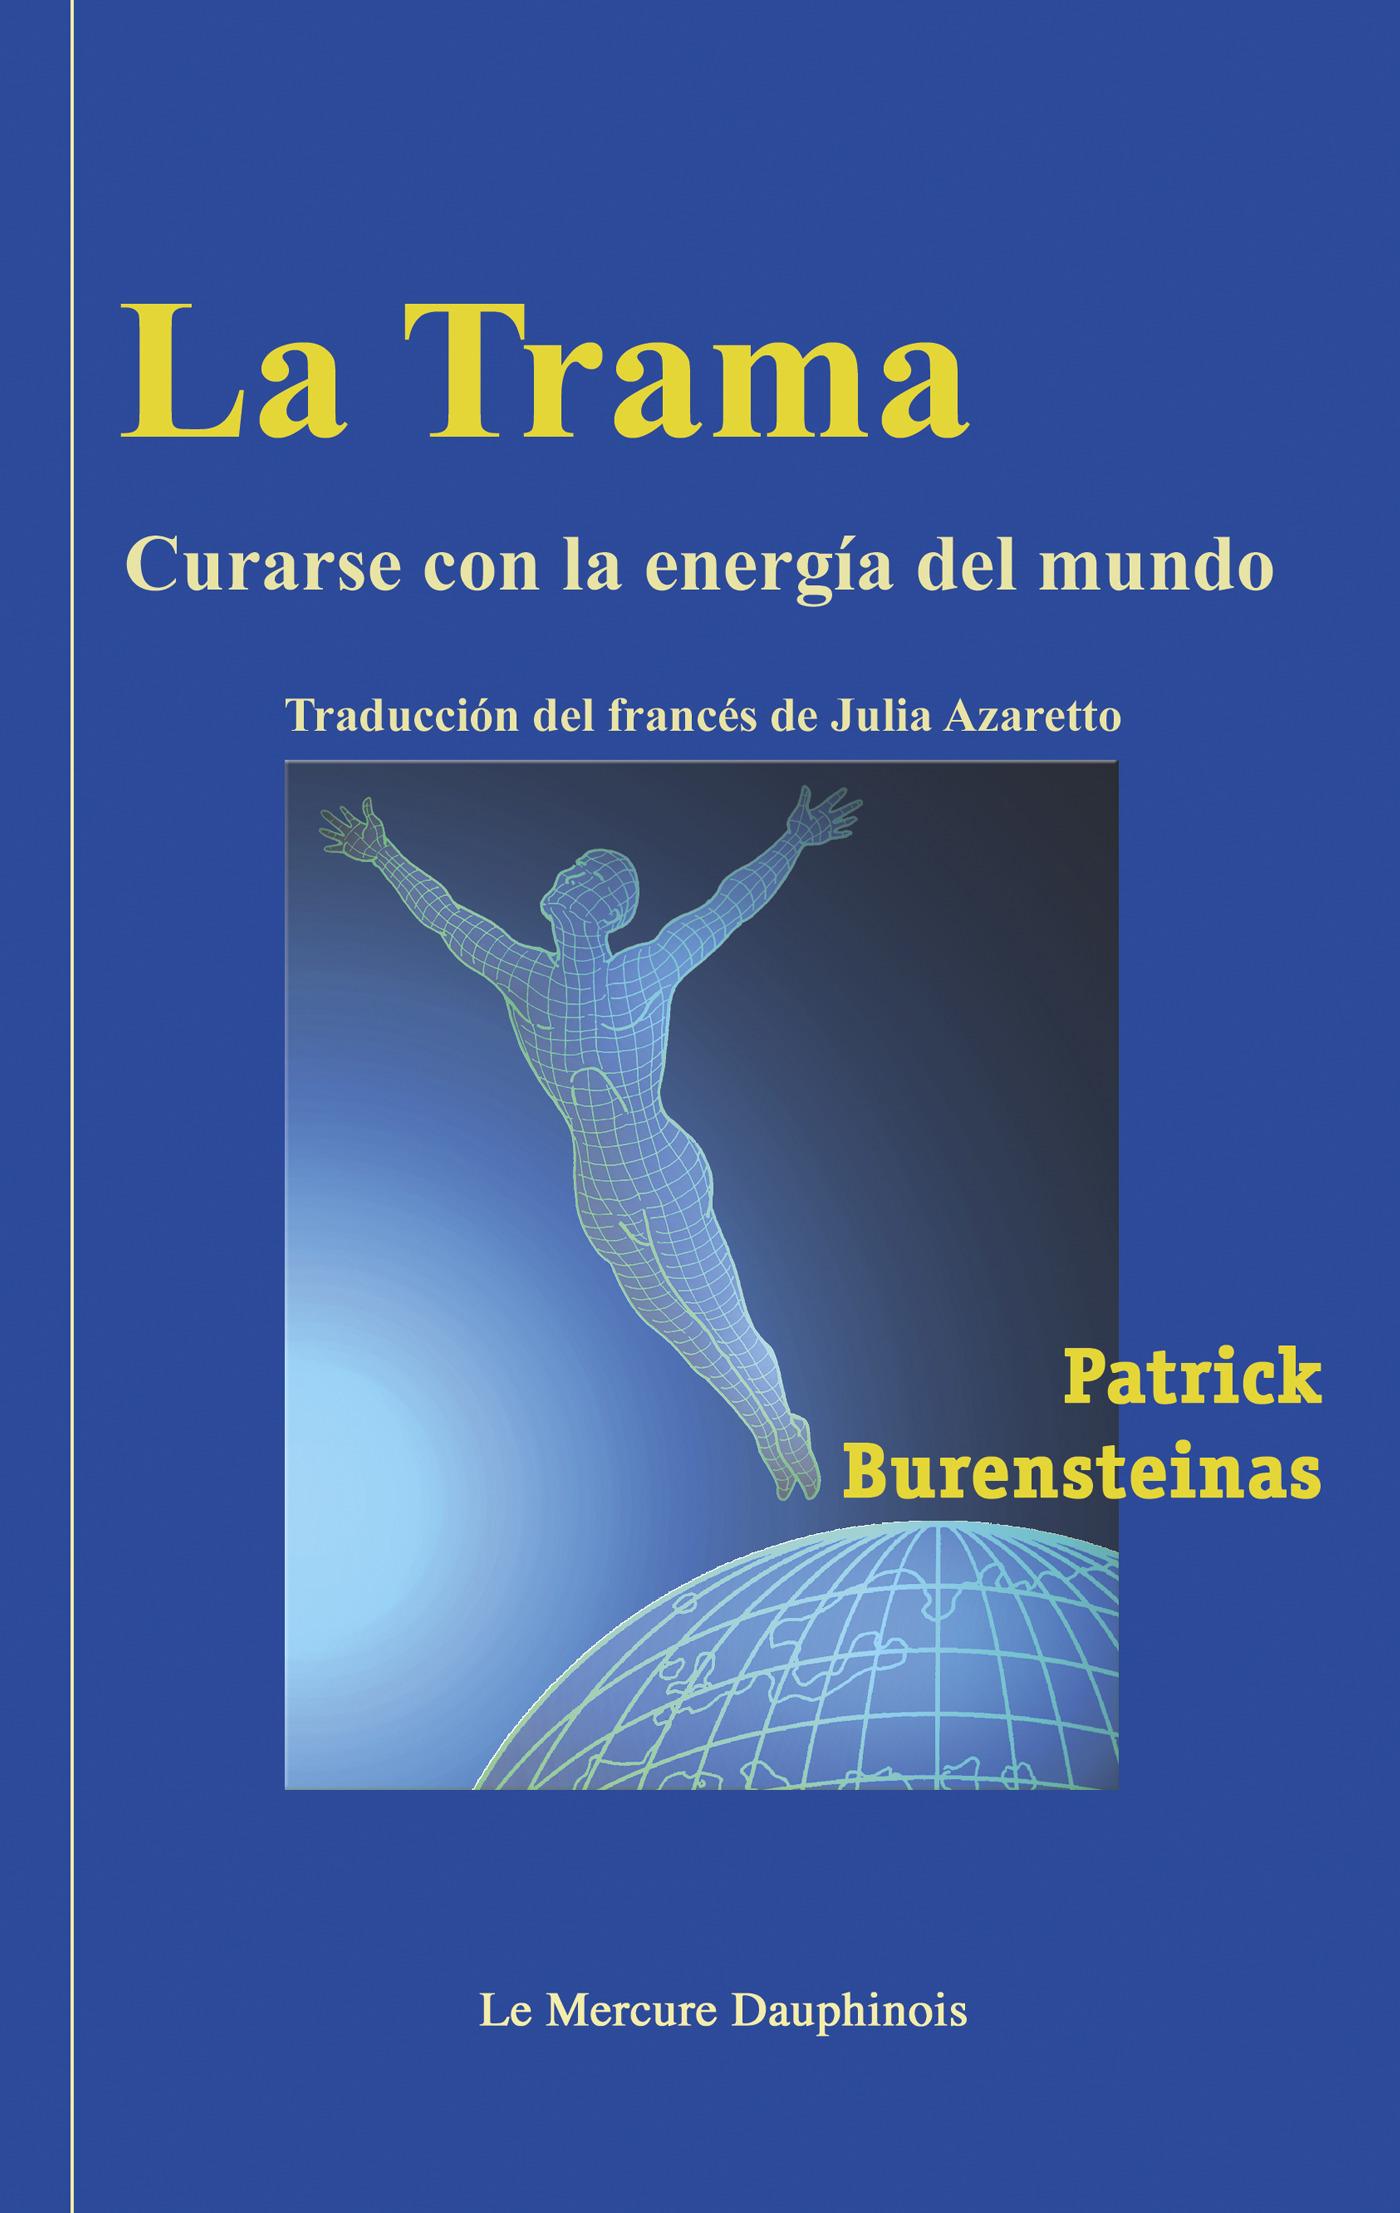 La Trama - Curarse con la energia del mundo